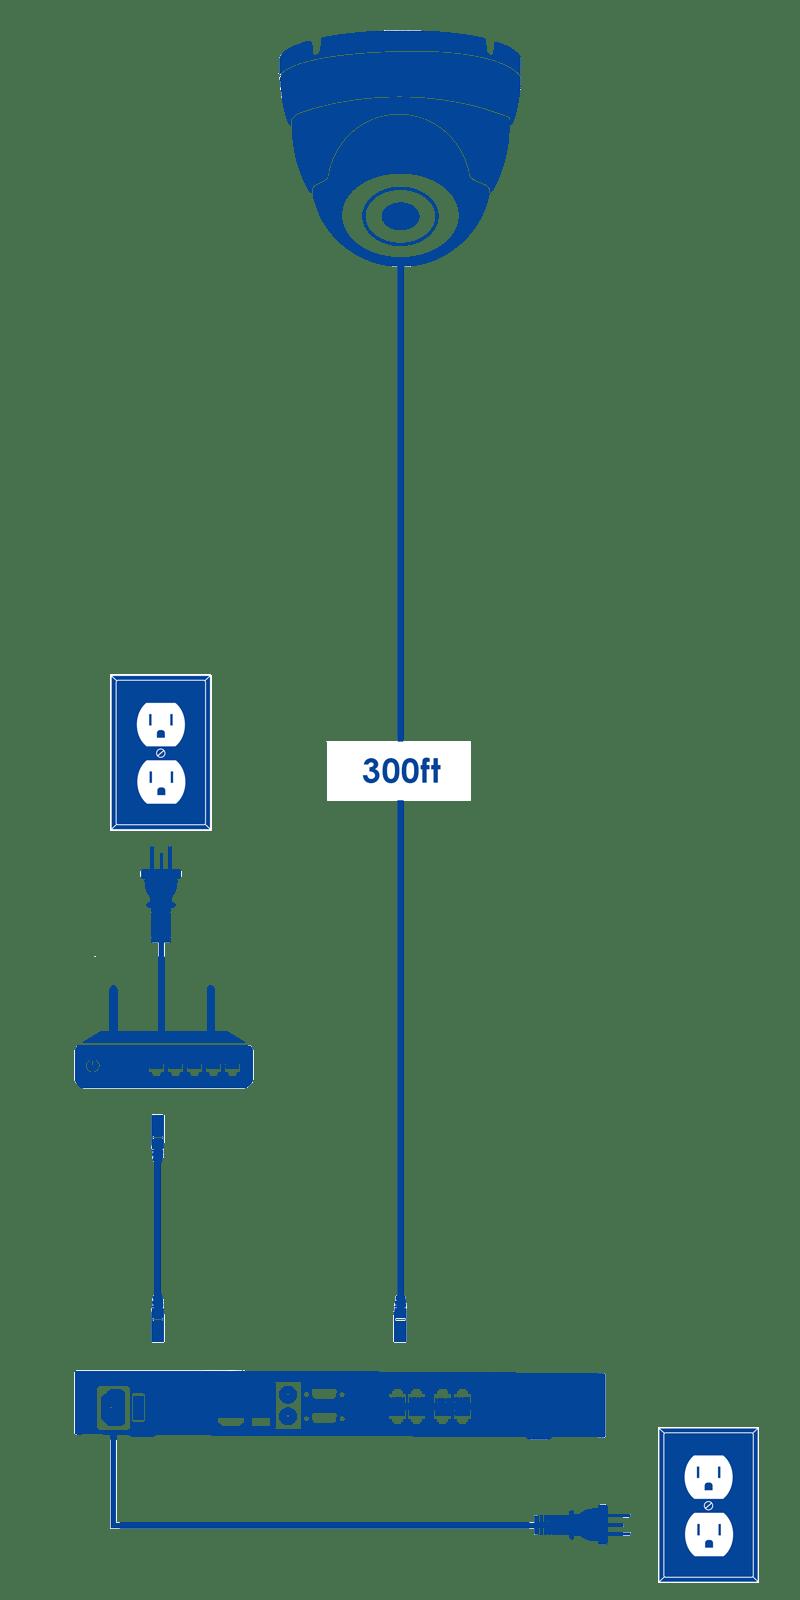 medium resolution of cctv camera installation diagram pdf cctv image cctv wiring diagram connection pdf jodebal com on cctv